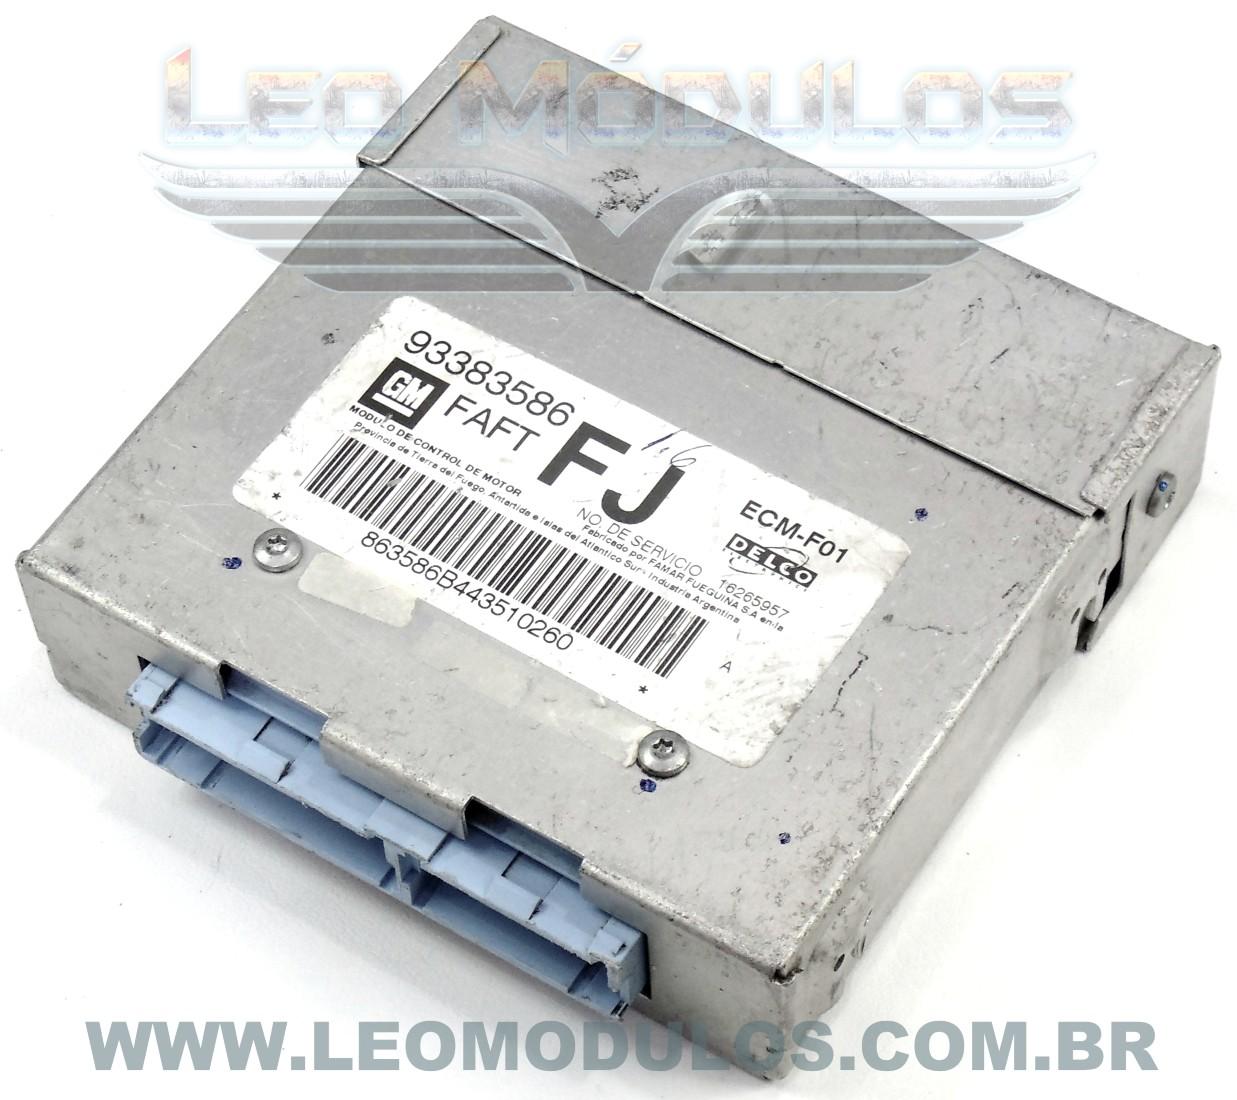 Módulo de injeção multec - FAFT FJ 93383586 16265957 - Chevrolet Corsa MPFI 1.6 8V - FAFT BI - Leo Módulos